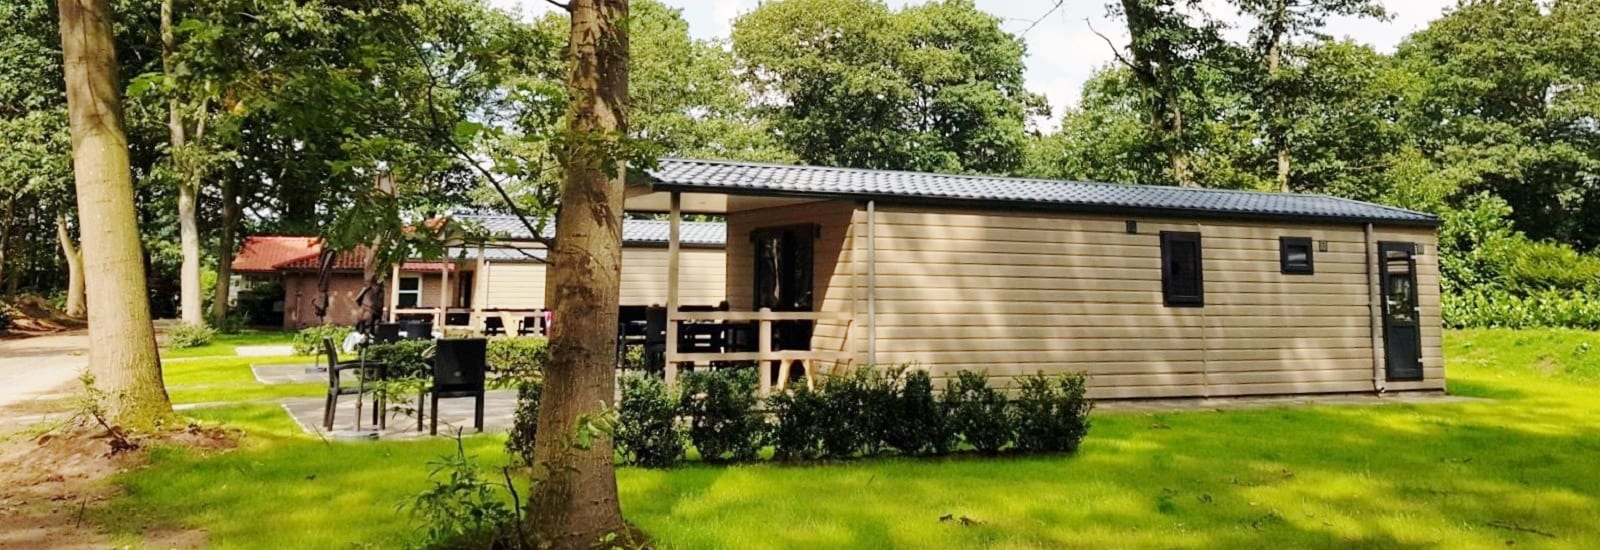 Mobilheim Basic Terrasse Lodge